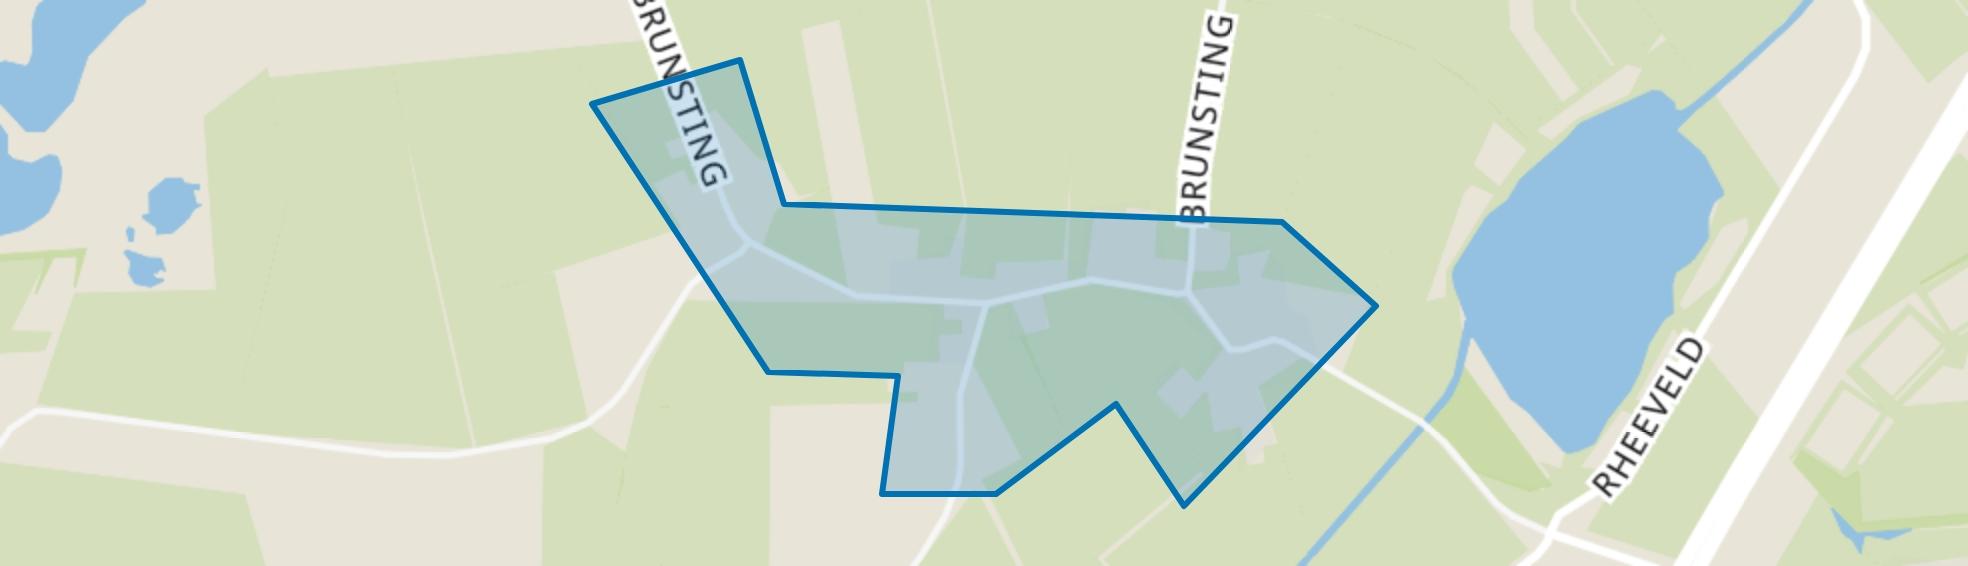 Brunsting, Beilen map